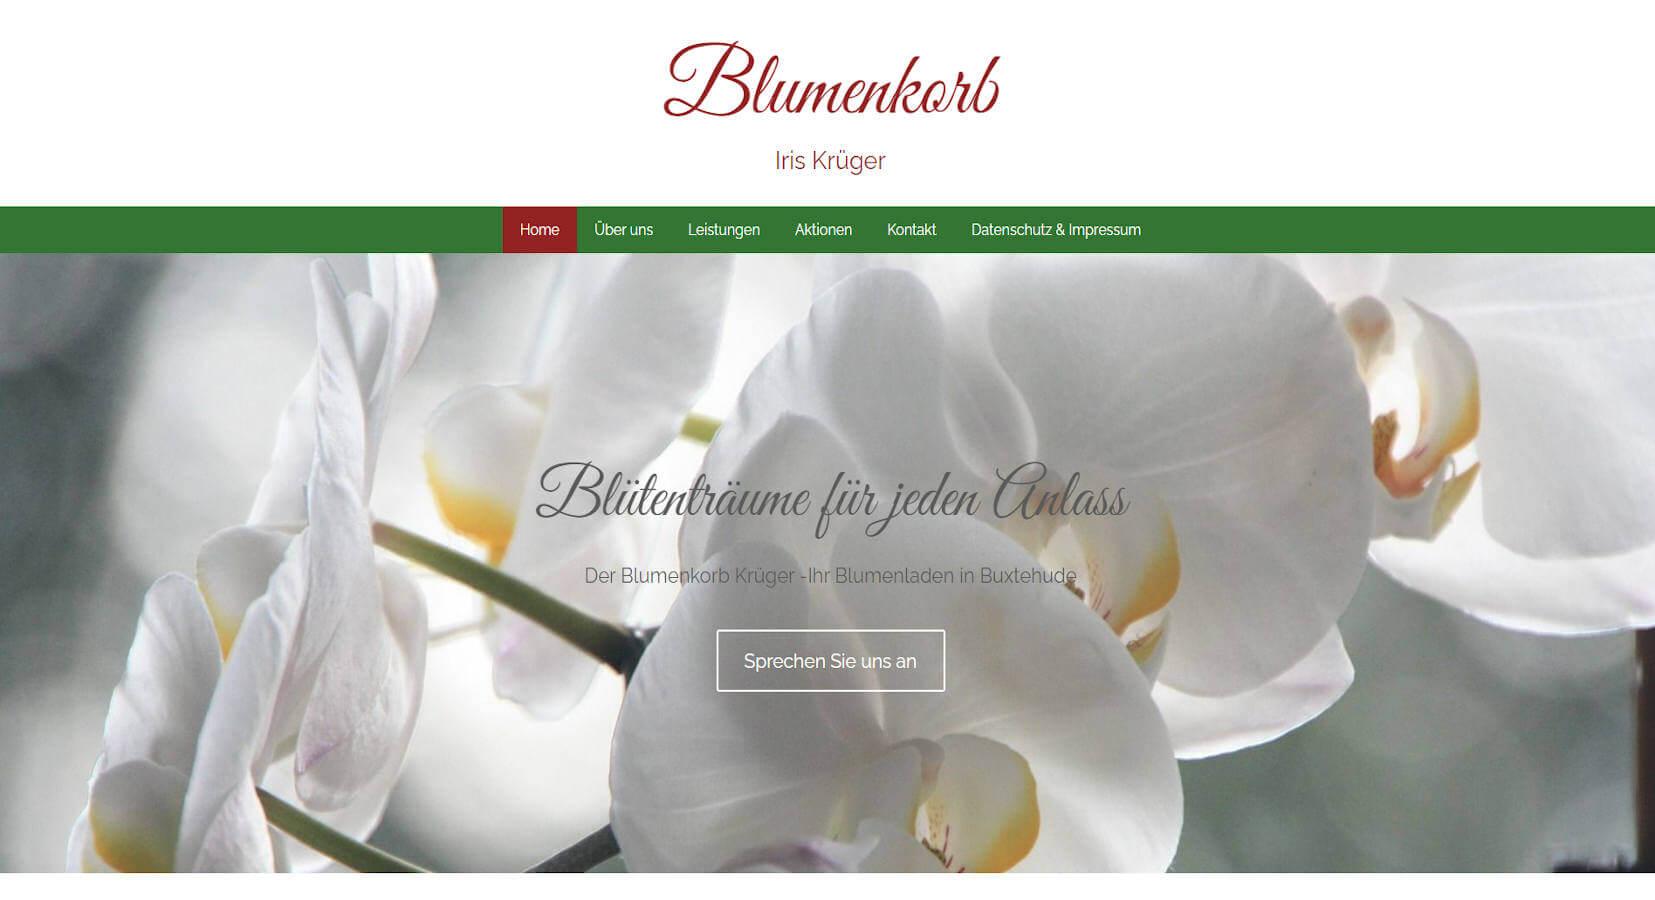 Blumenkorb Iris Krüger